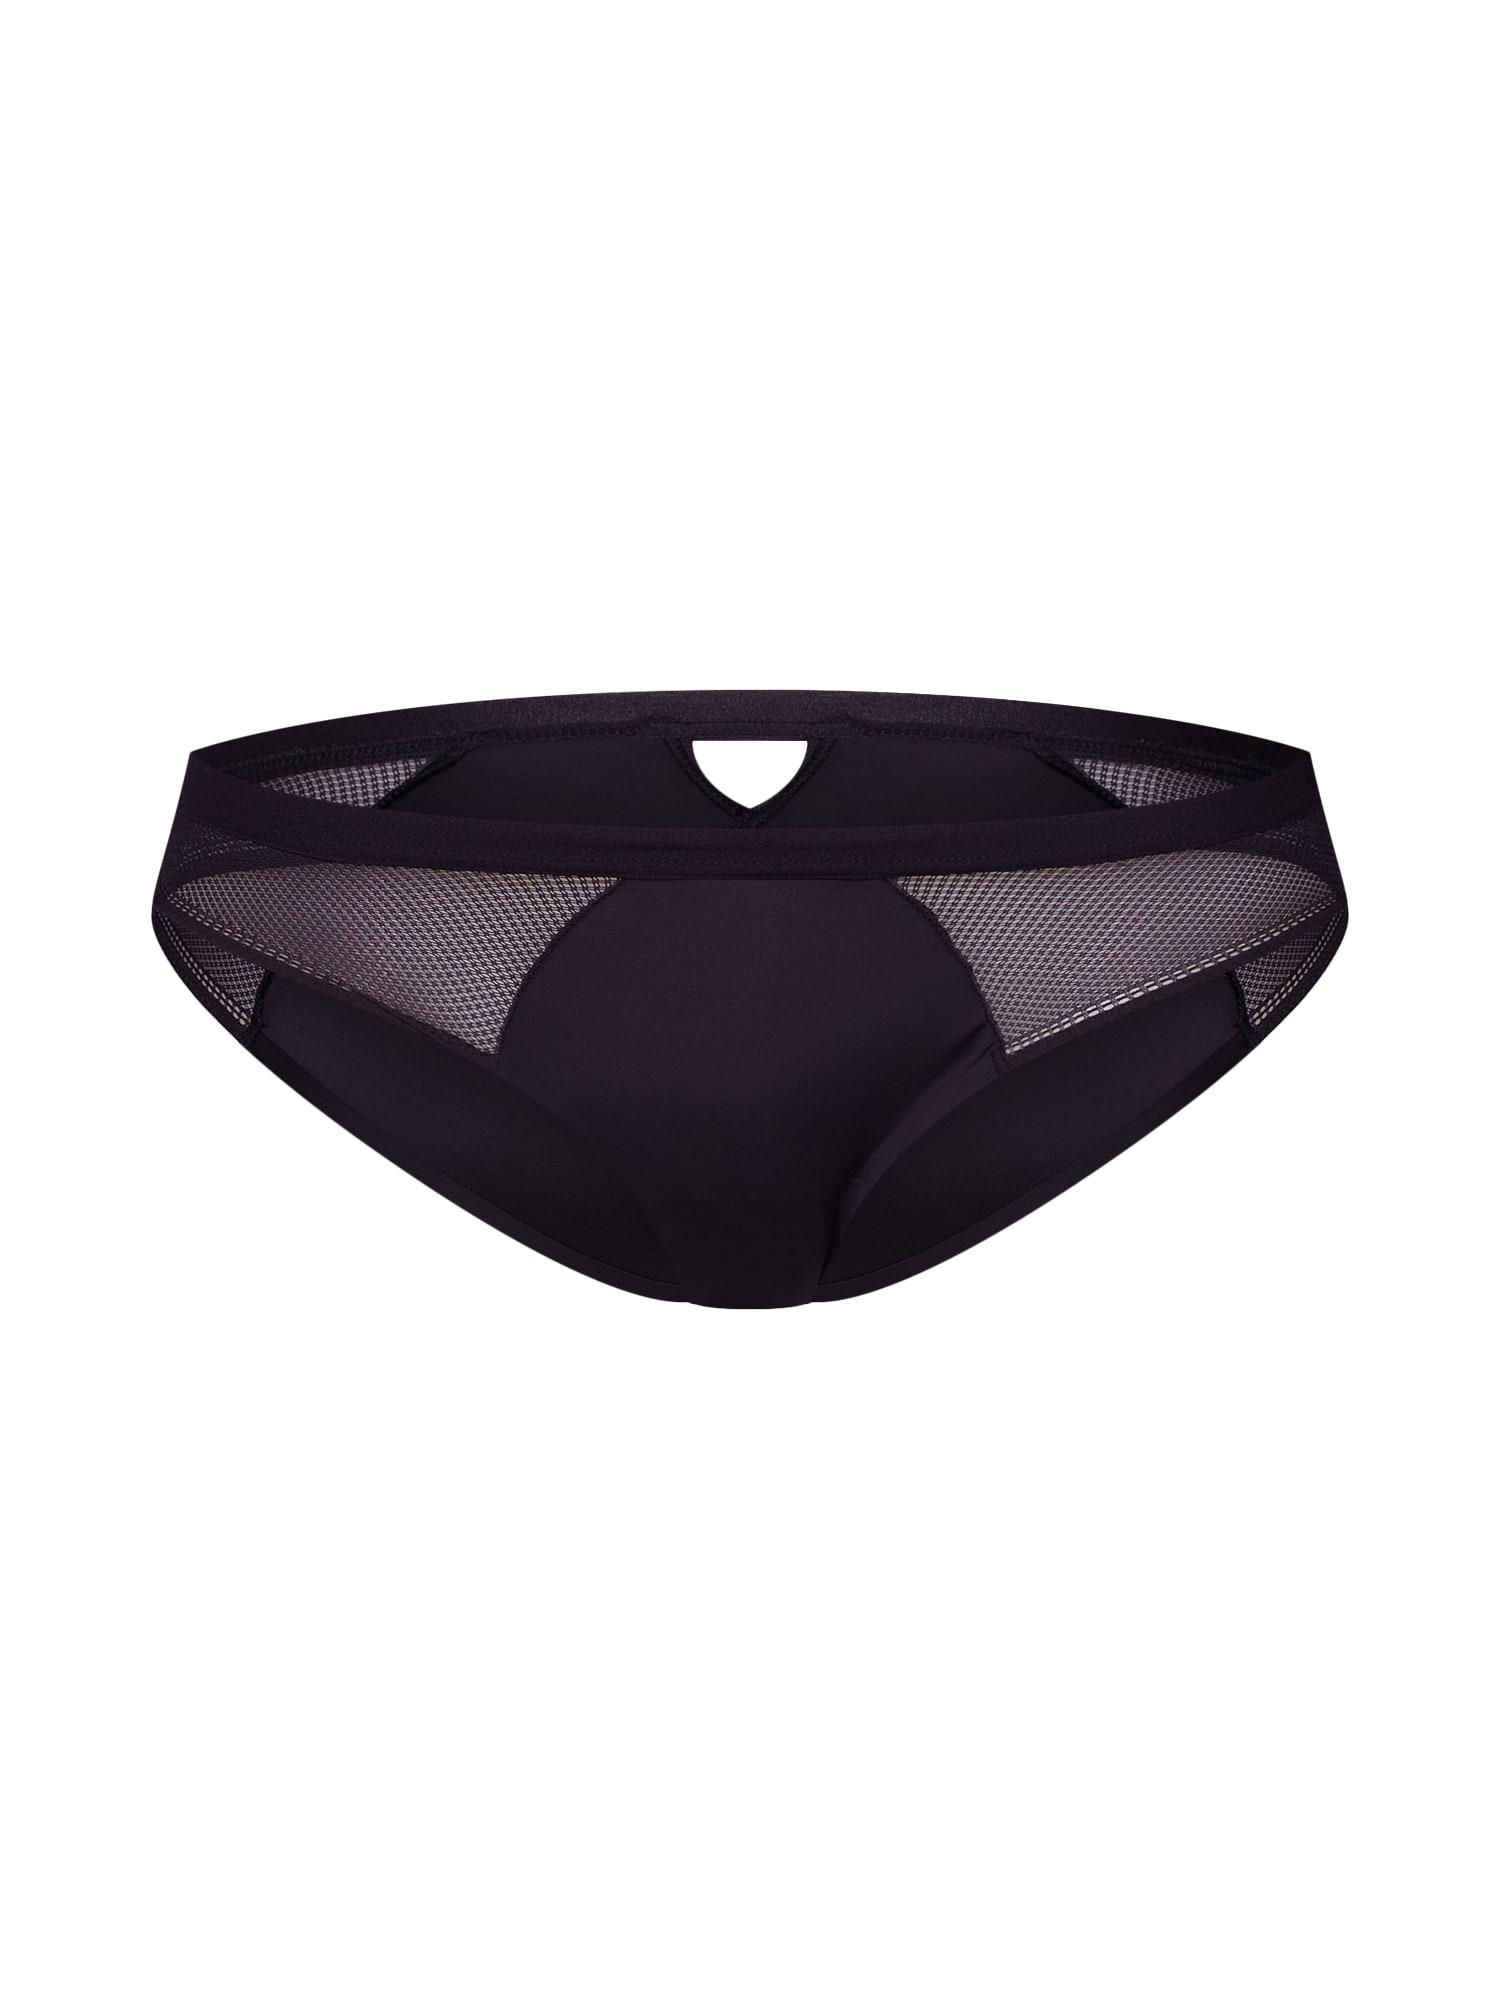 Kalhotky sloggi S Symmetry Low Rise Cheeky černá SLOGGI